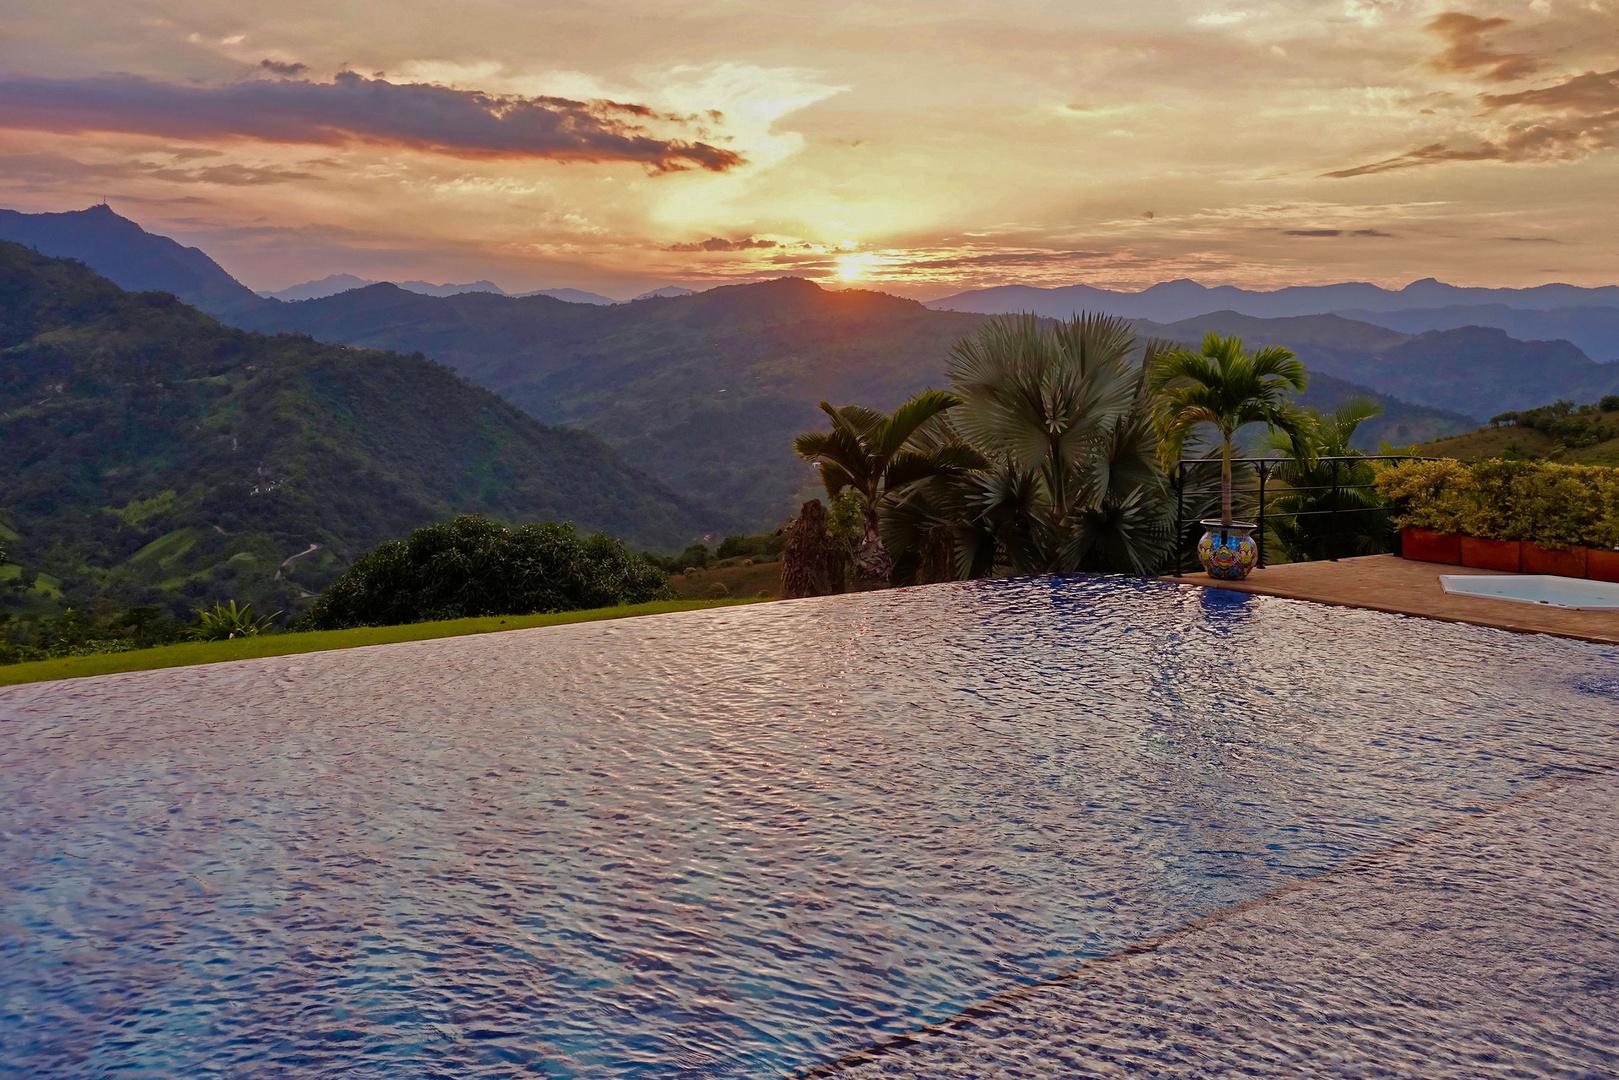 2019.01.05, Nocaima, Colombia